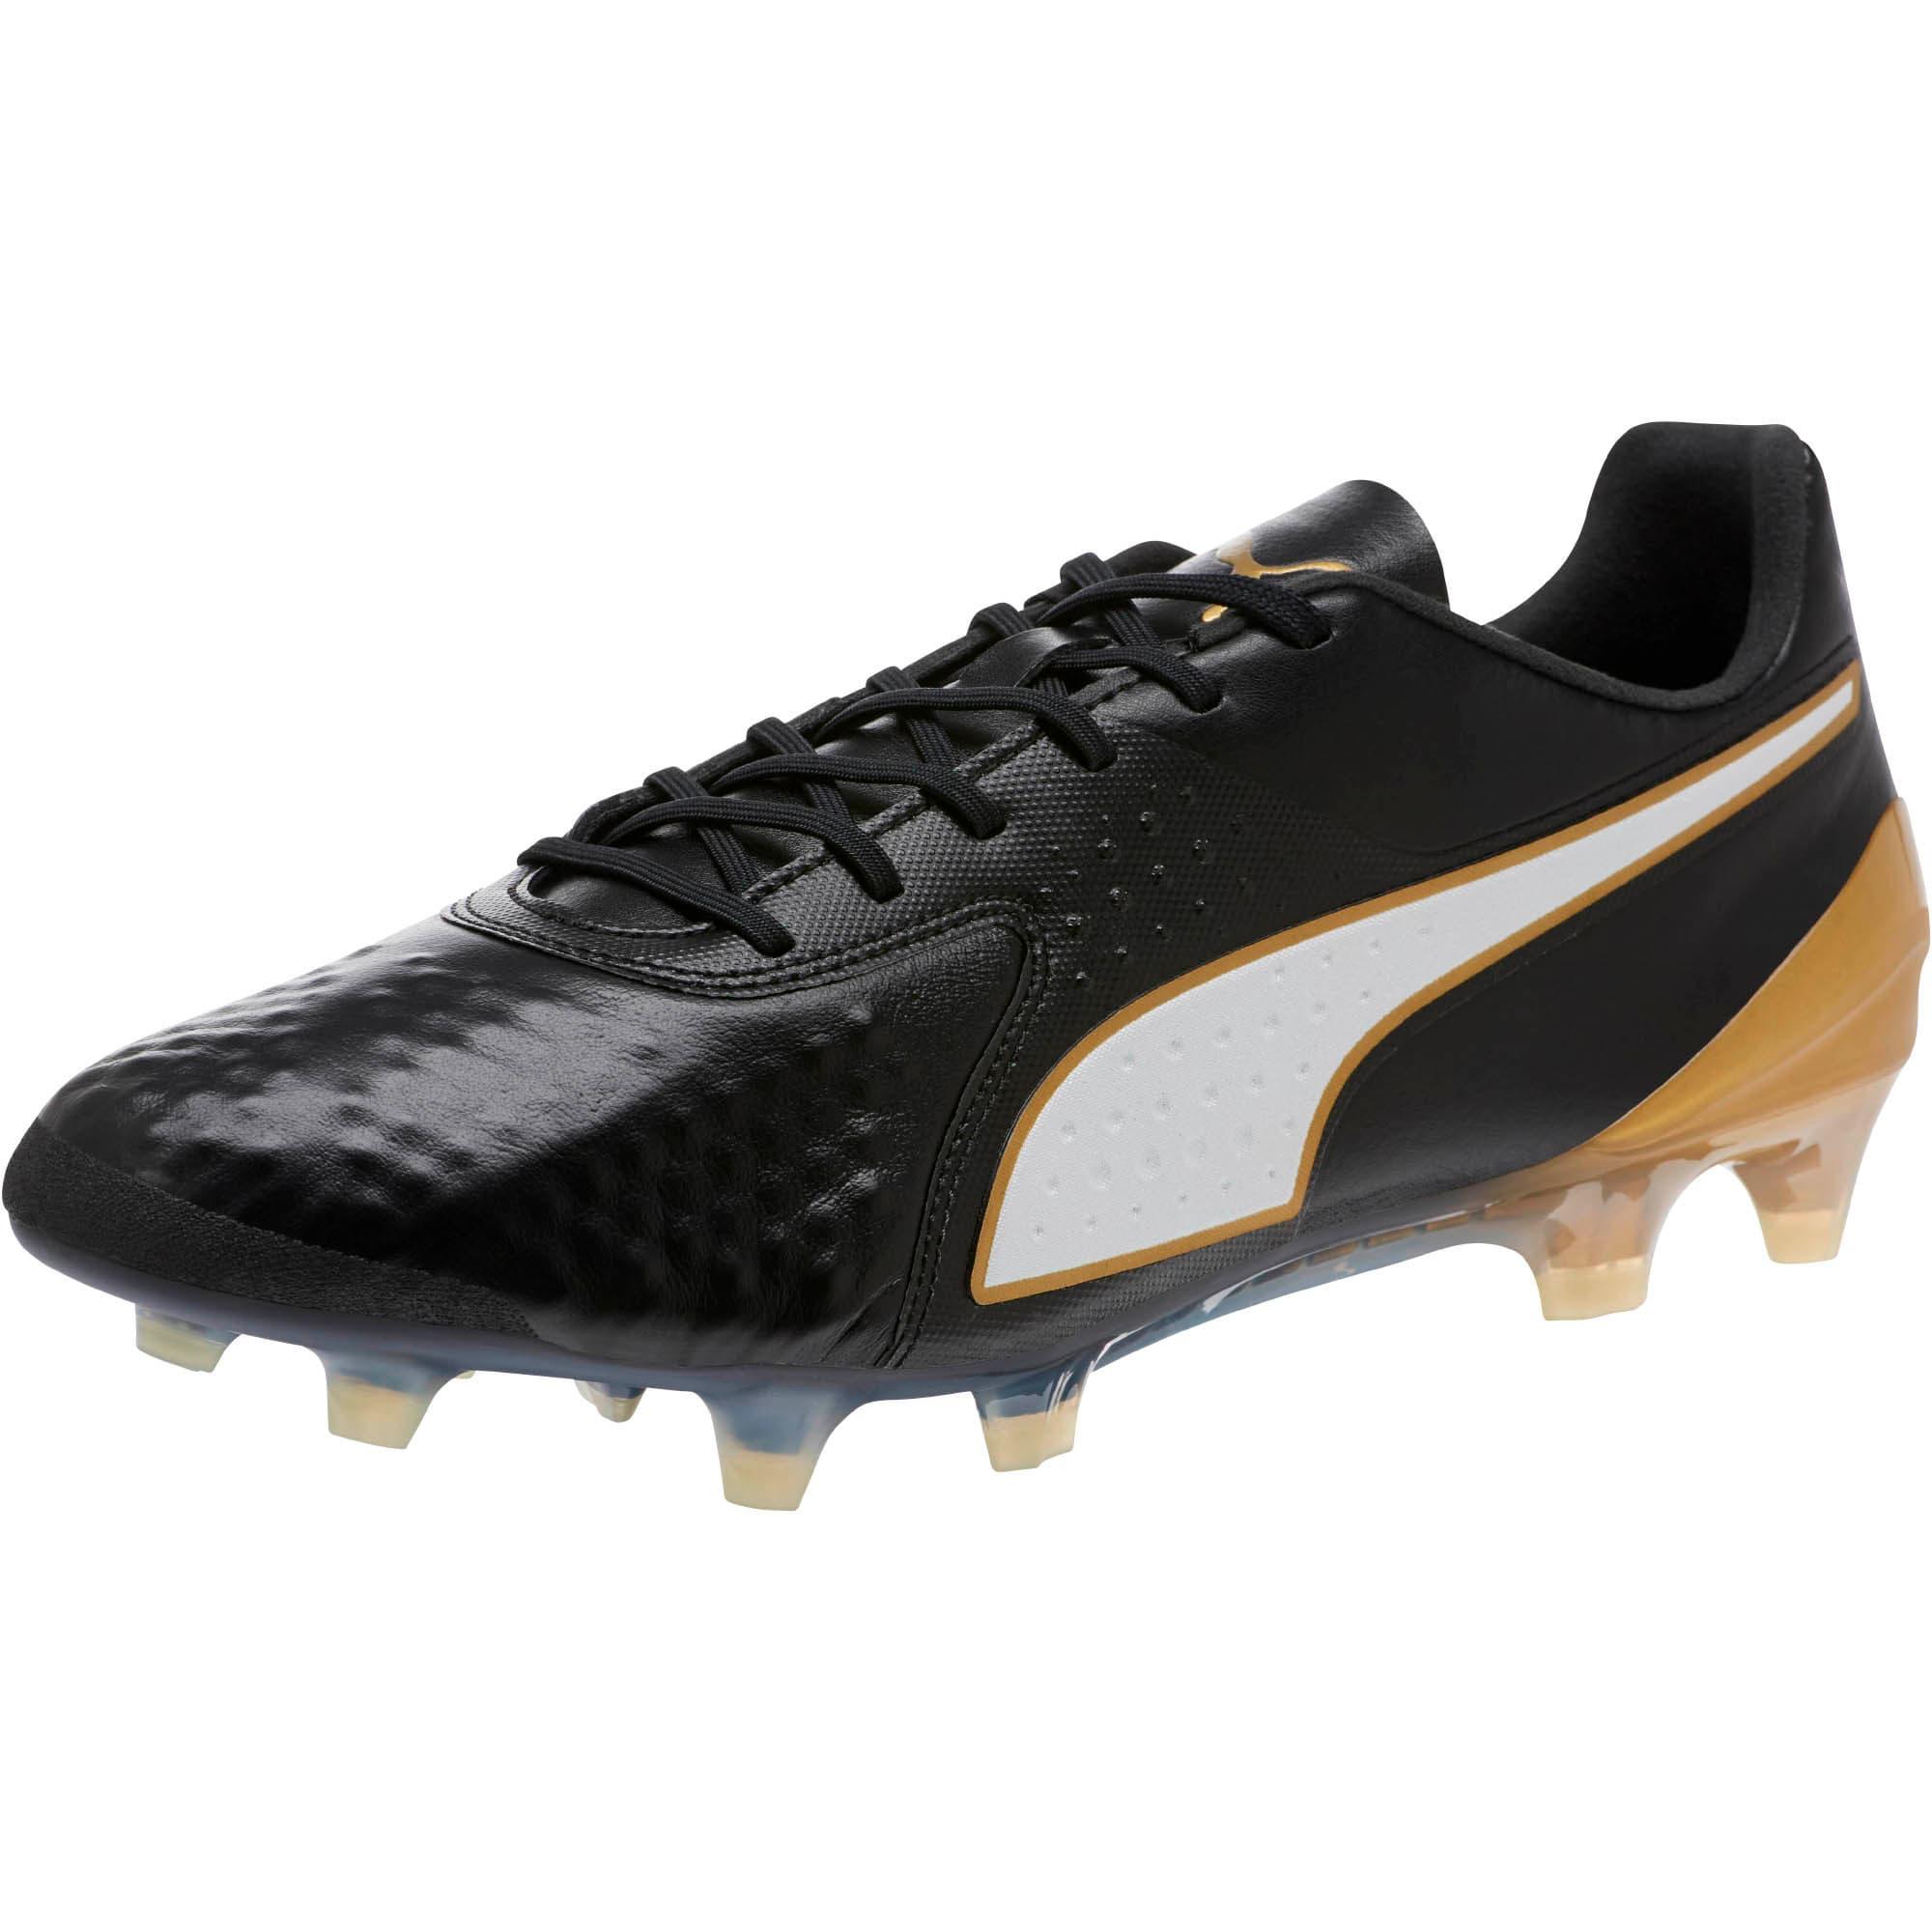 Thumbnail 1 of PUMA ONE 19.1 FG/AG Soccer Cleats, Black-White-Gold, medium